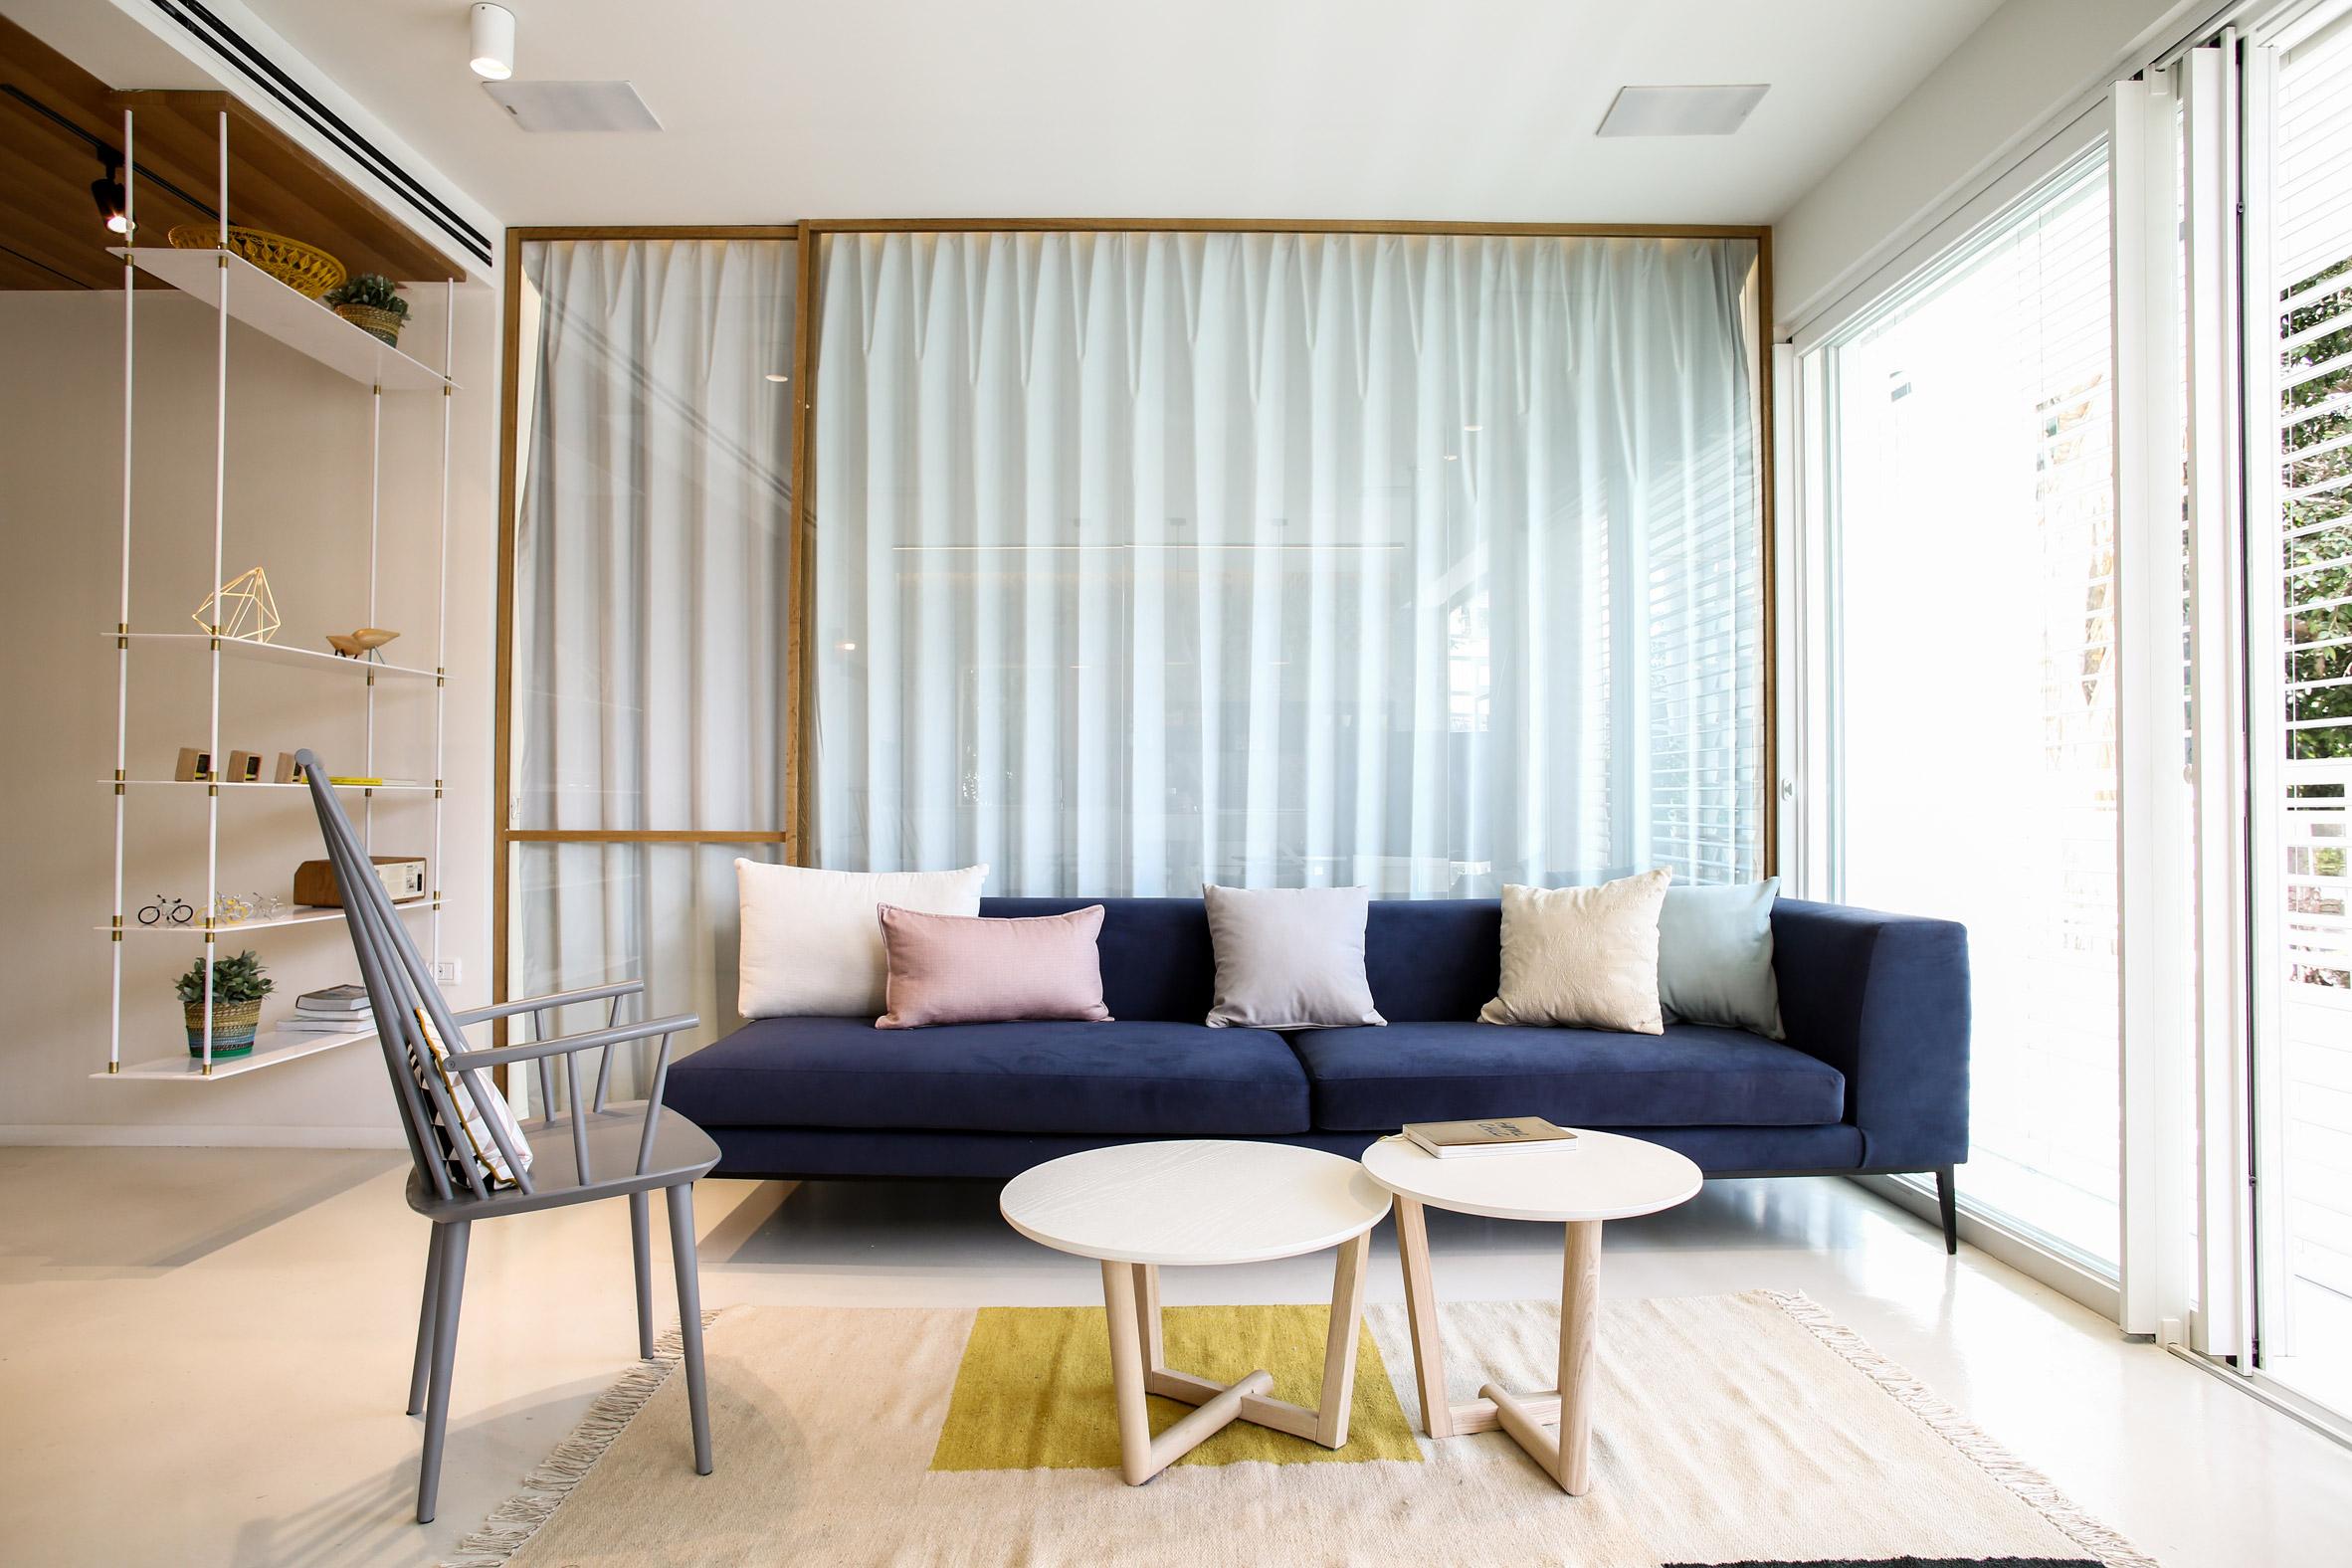 weisel-apartment-tel-aviv-israel-dori-design-studio-renovation_dezeen_2364_col_12